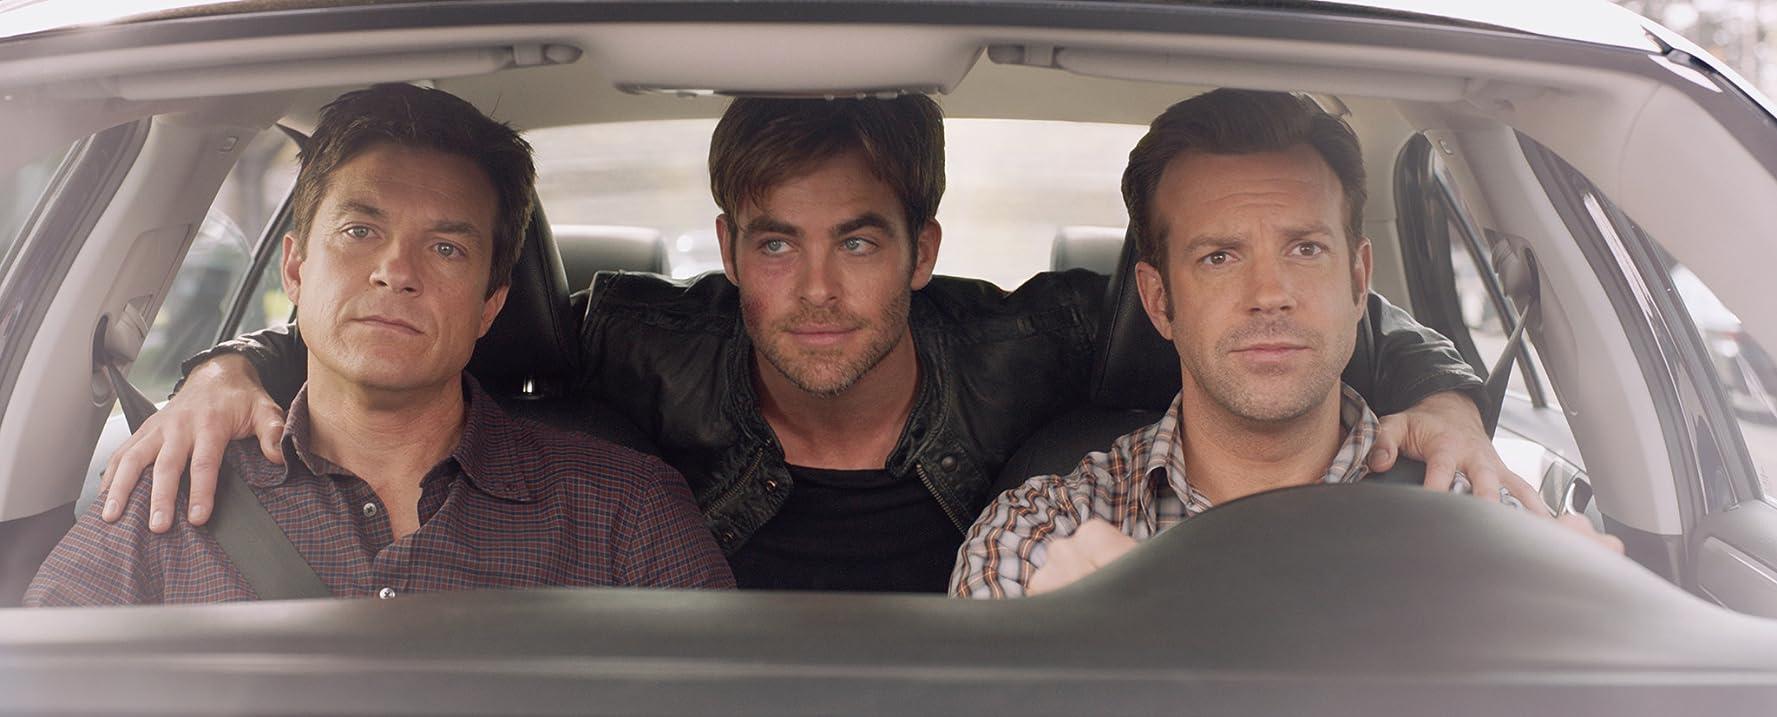 Jason Bateman, Jason Sudeikis, and Chris Pine in Horrible Bosses 2 (2014)